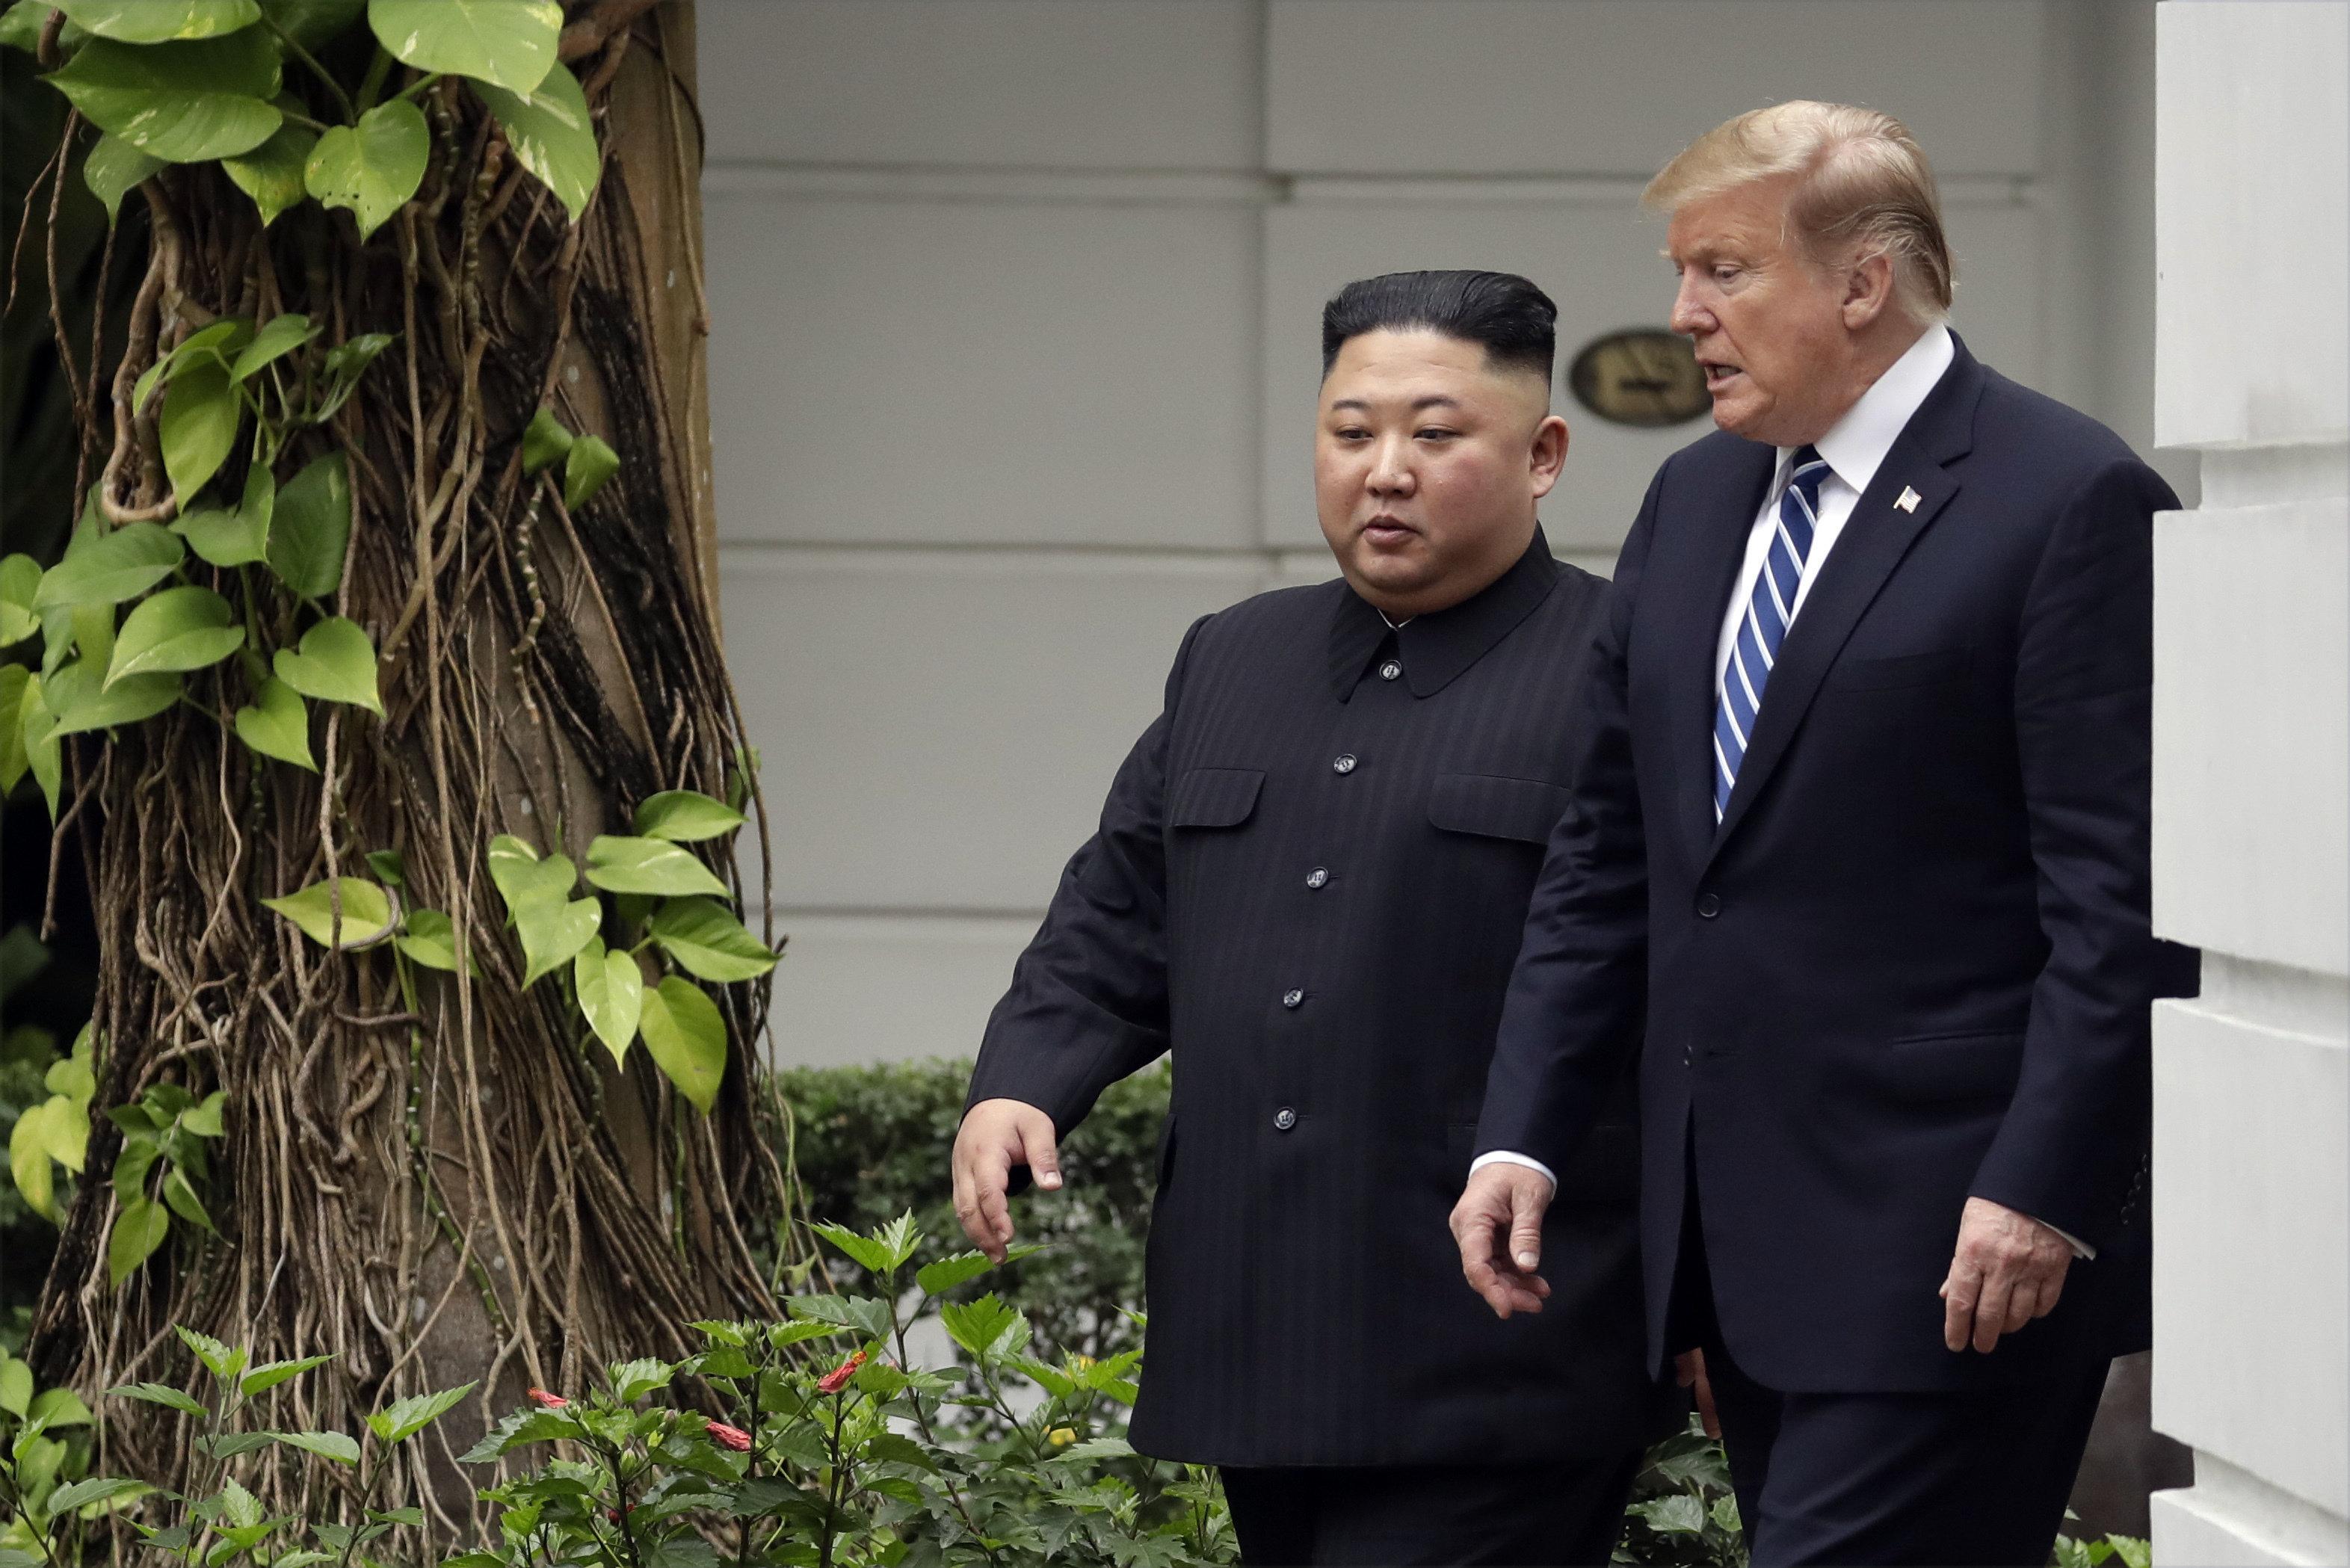 President Donald Trump and North Korean leader Kim Jong Un take a walk after their first meeting at the Sofitel Legend Metropole Hanoi hotel, Thursday, Feb. 28, 2019, in Hanoi. (AP Photo/Evan Vucci)